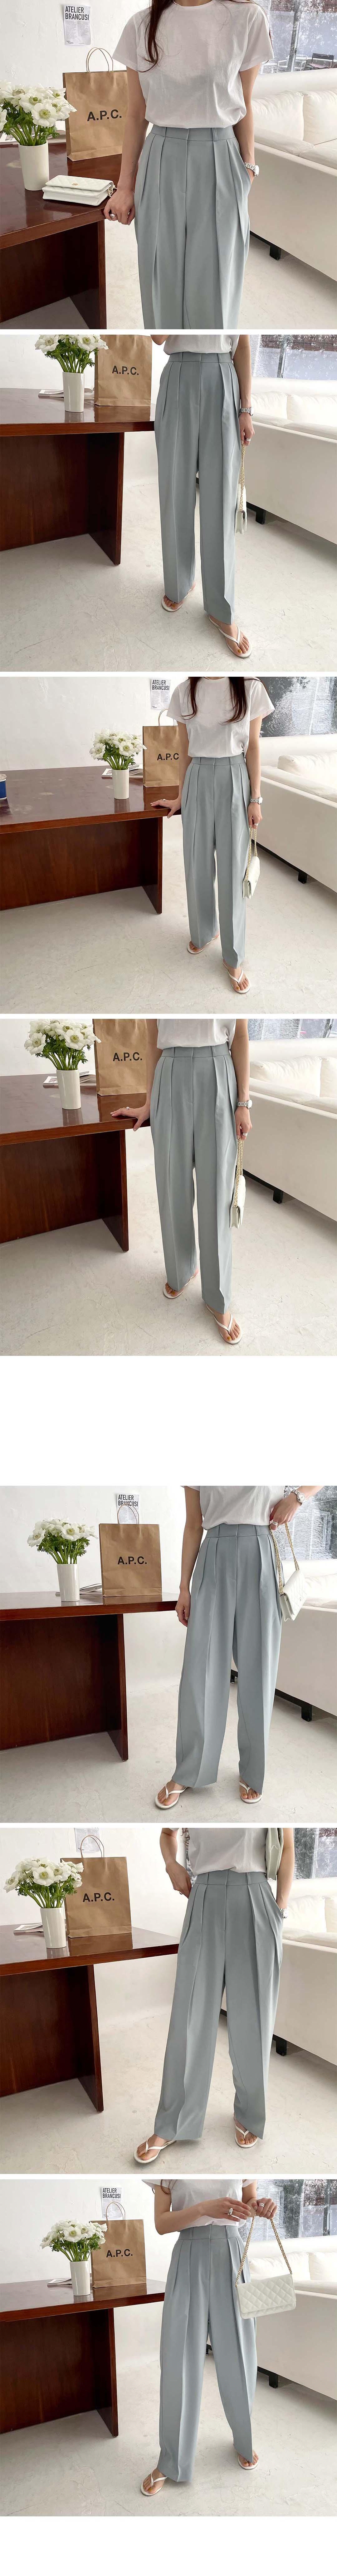 Hcf1e45543bf84c80aa023dc84dae8cdbG - Summer Korean High Waist Loose Folds Wide Leg Solid Suit Pants